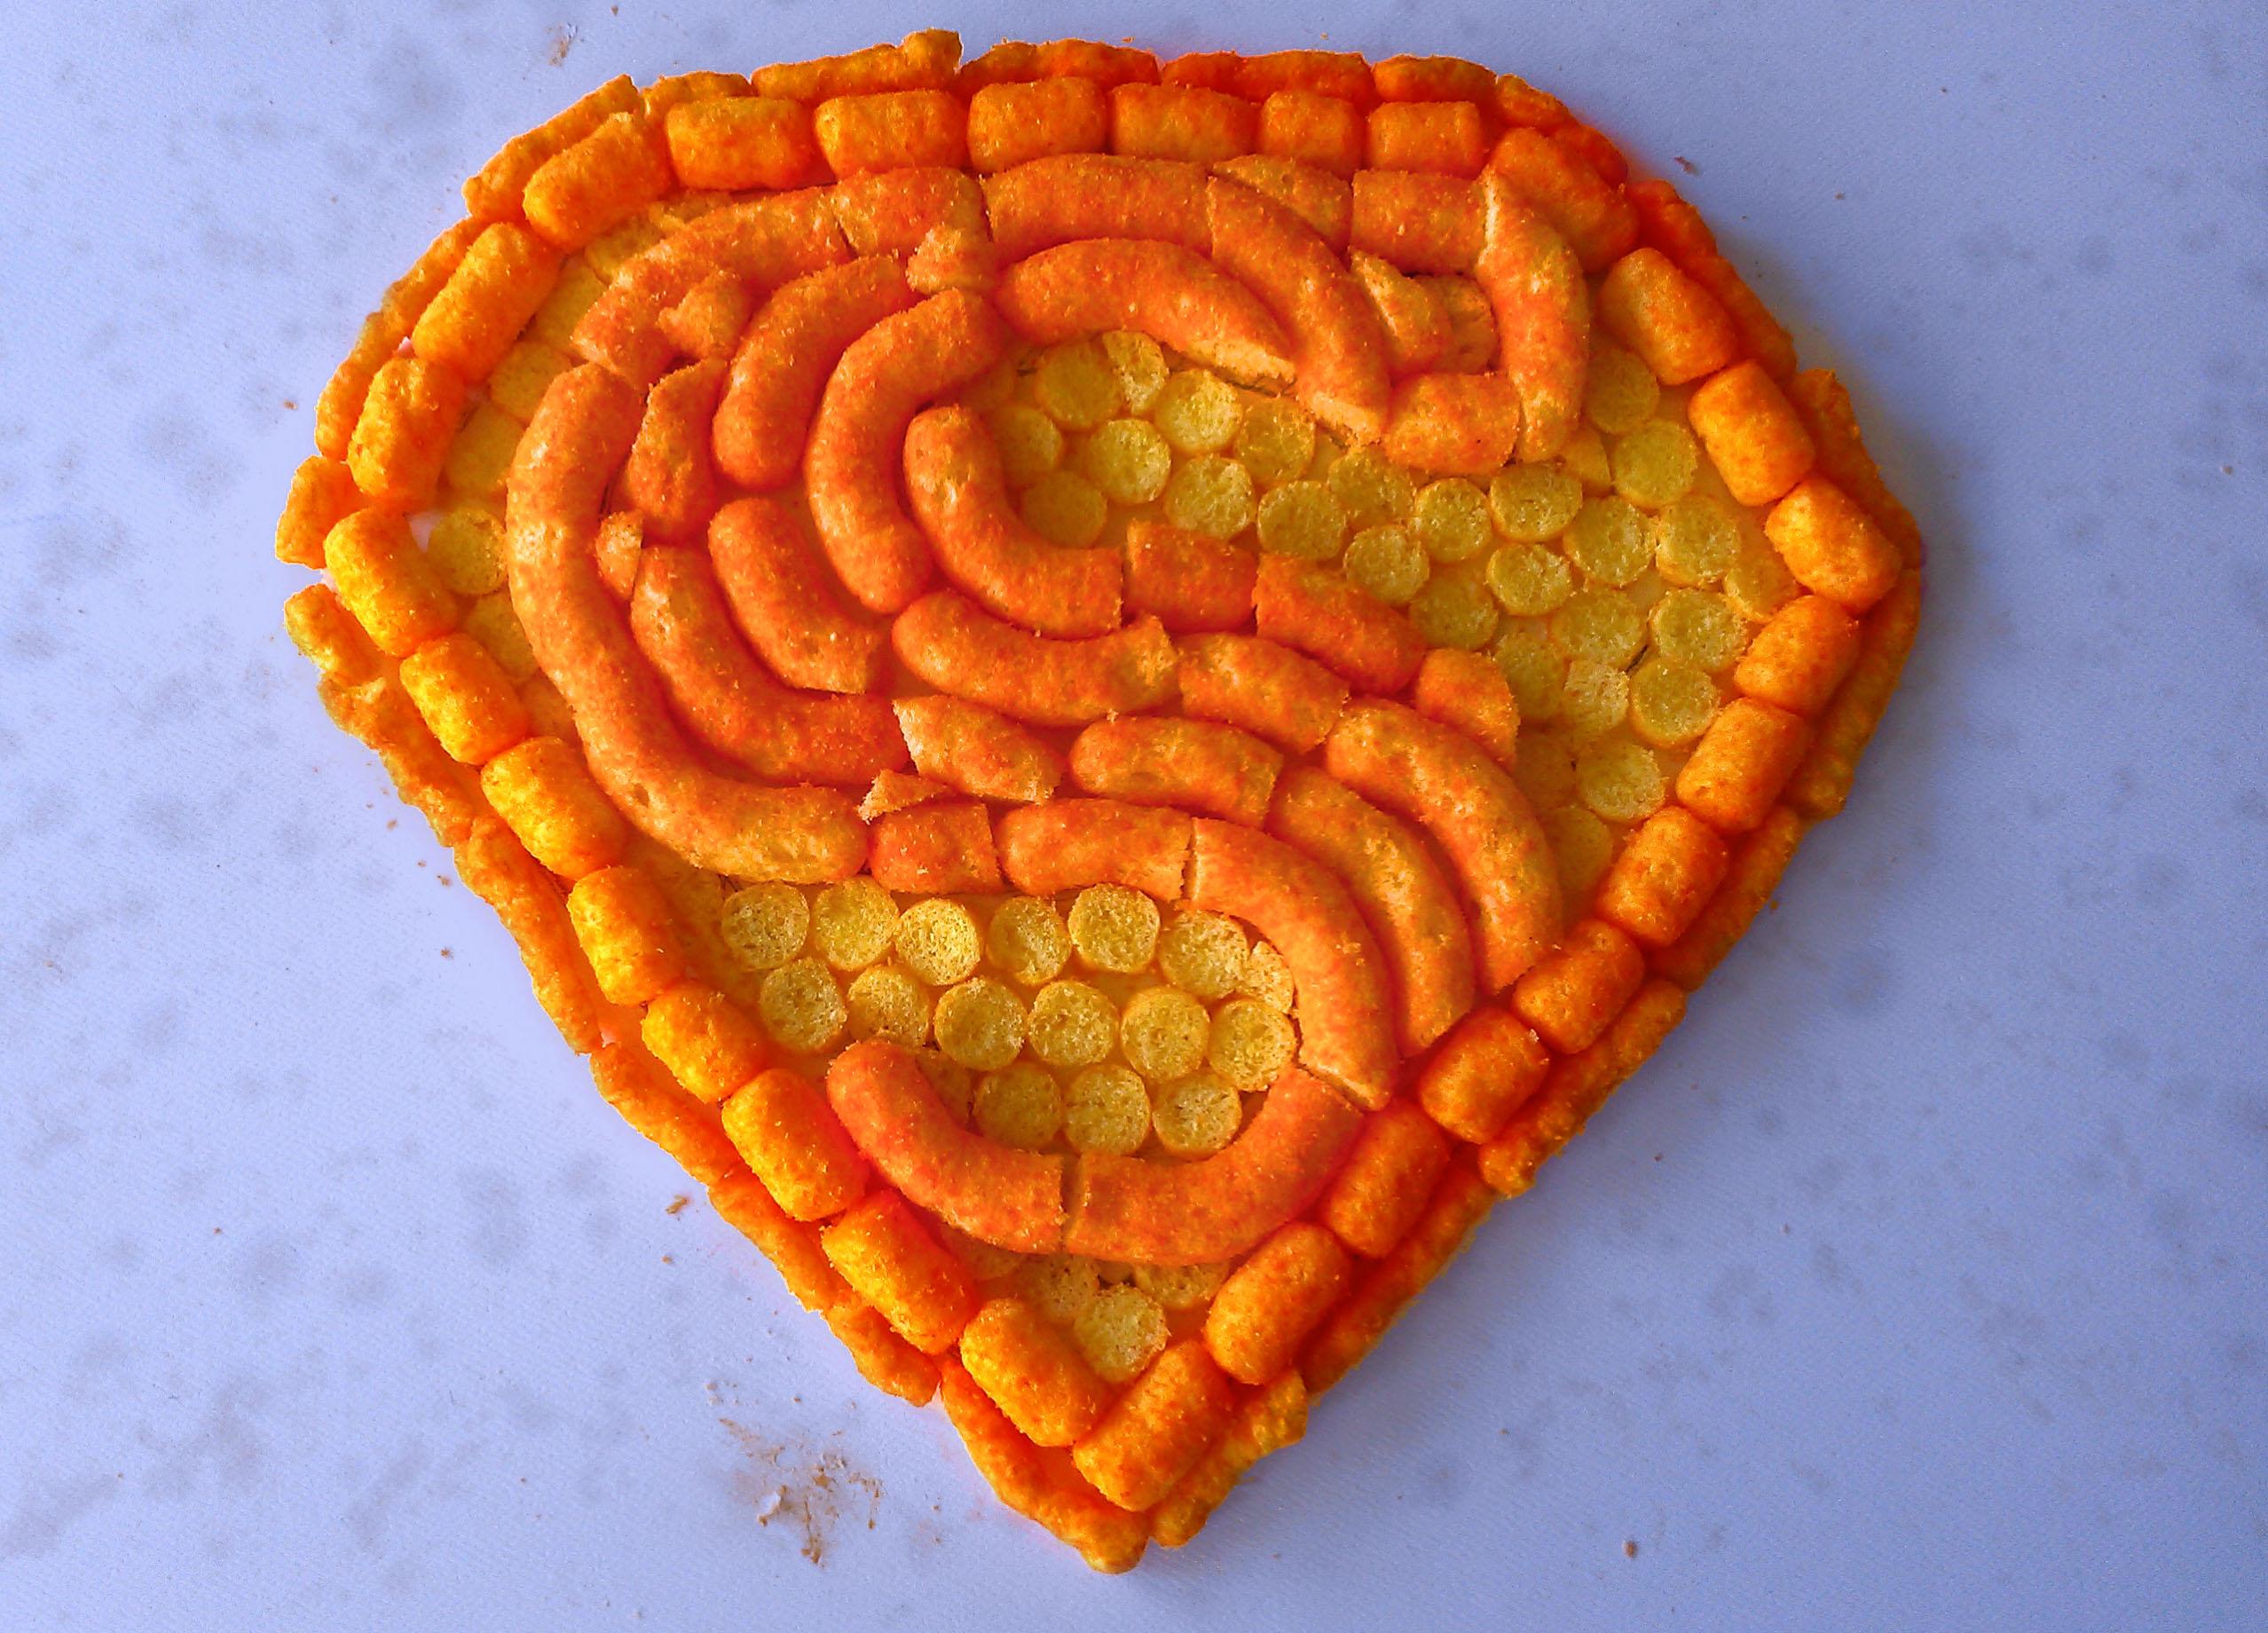 cheetos-superman-ck-Lunchbox1.jpg